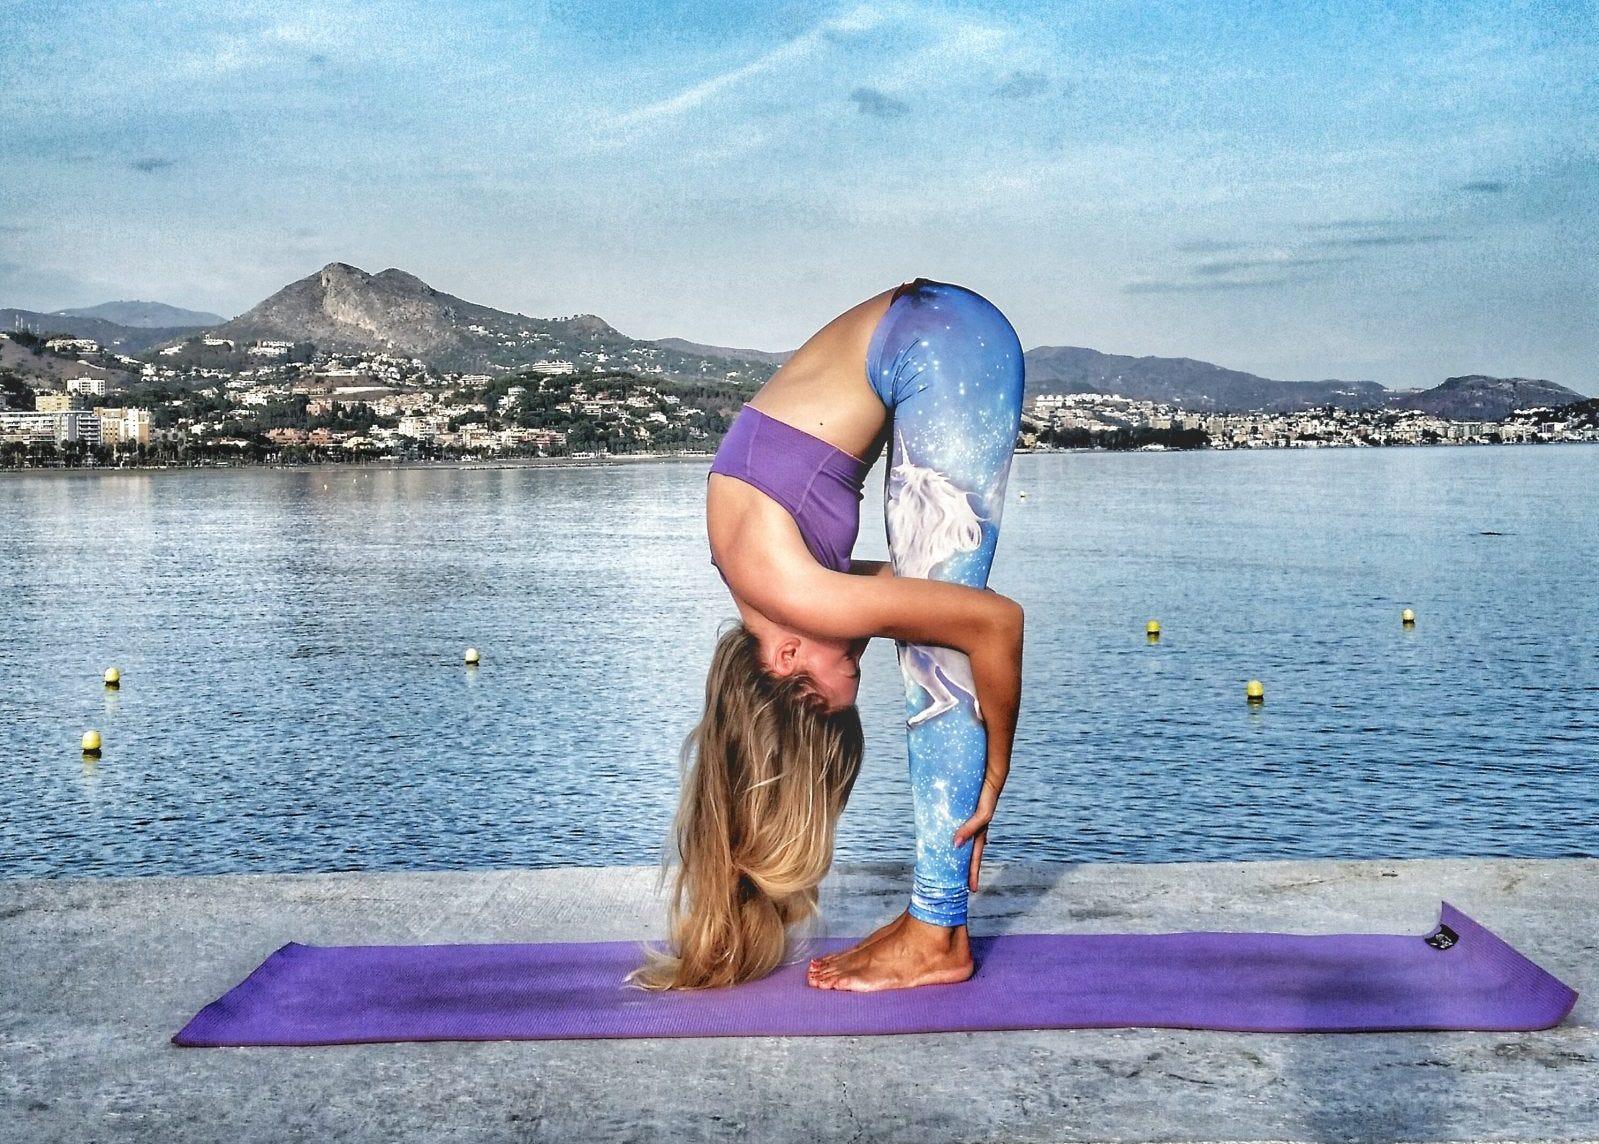 A woman doing a forward fold on a yoga mat by the sea.